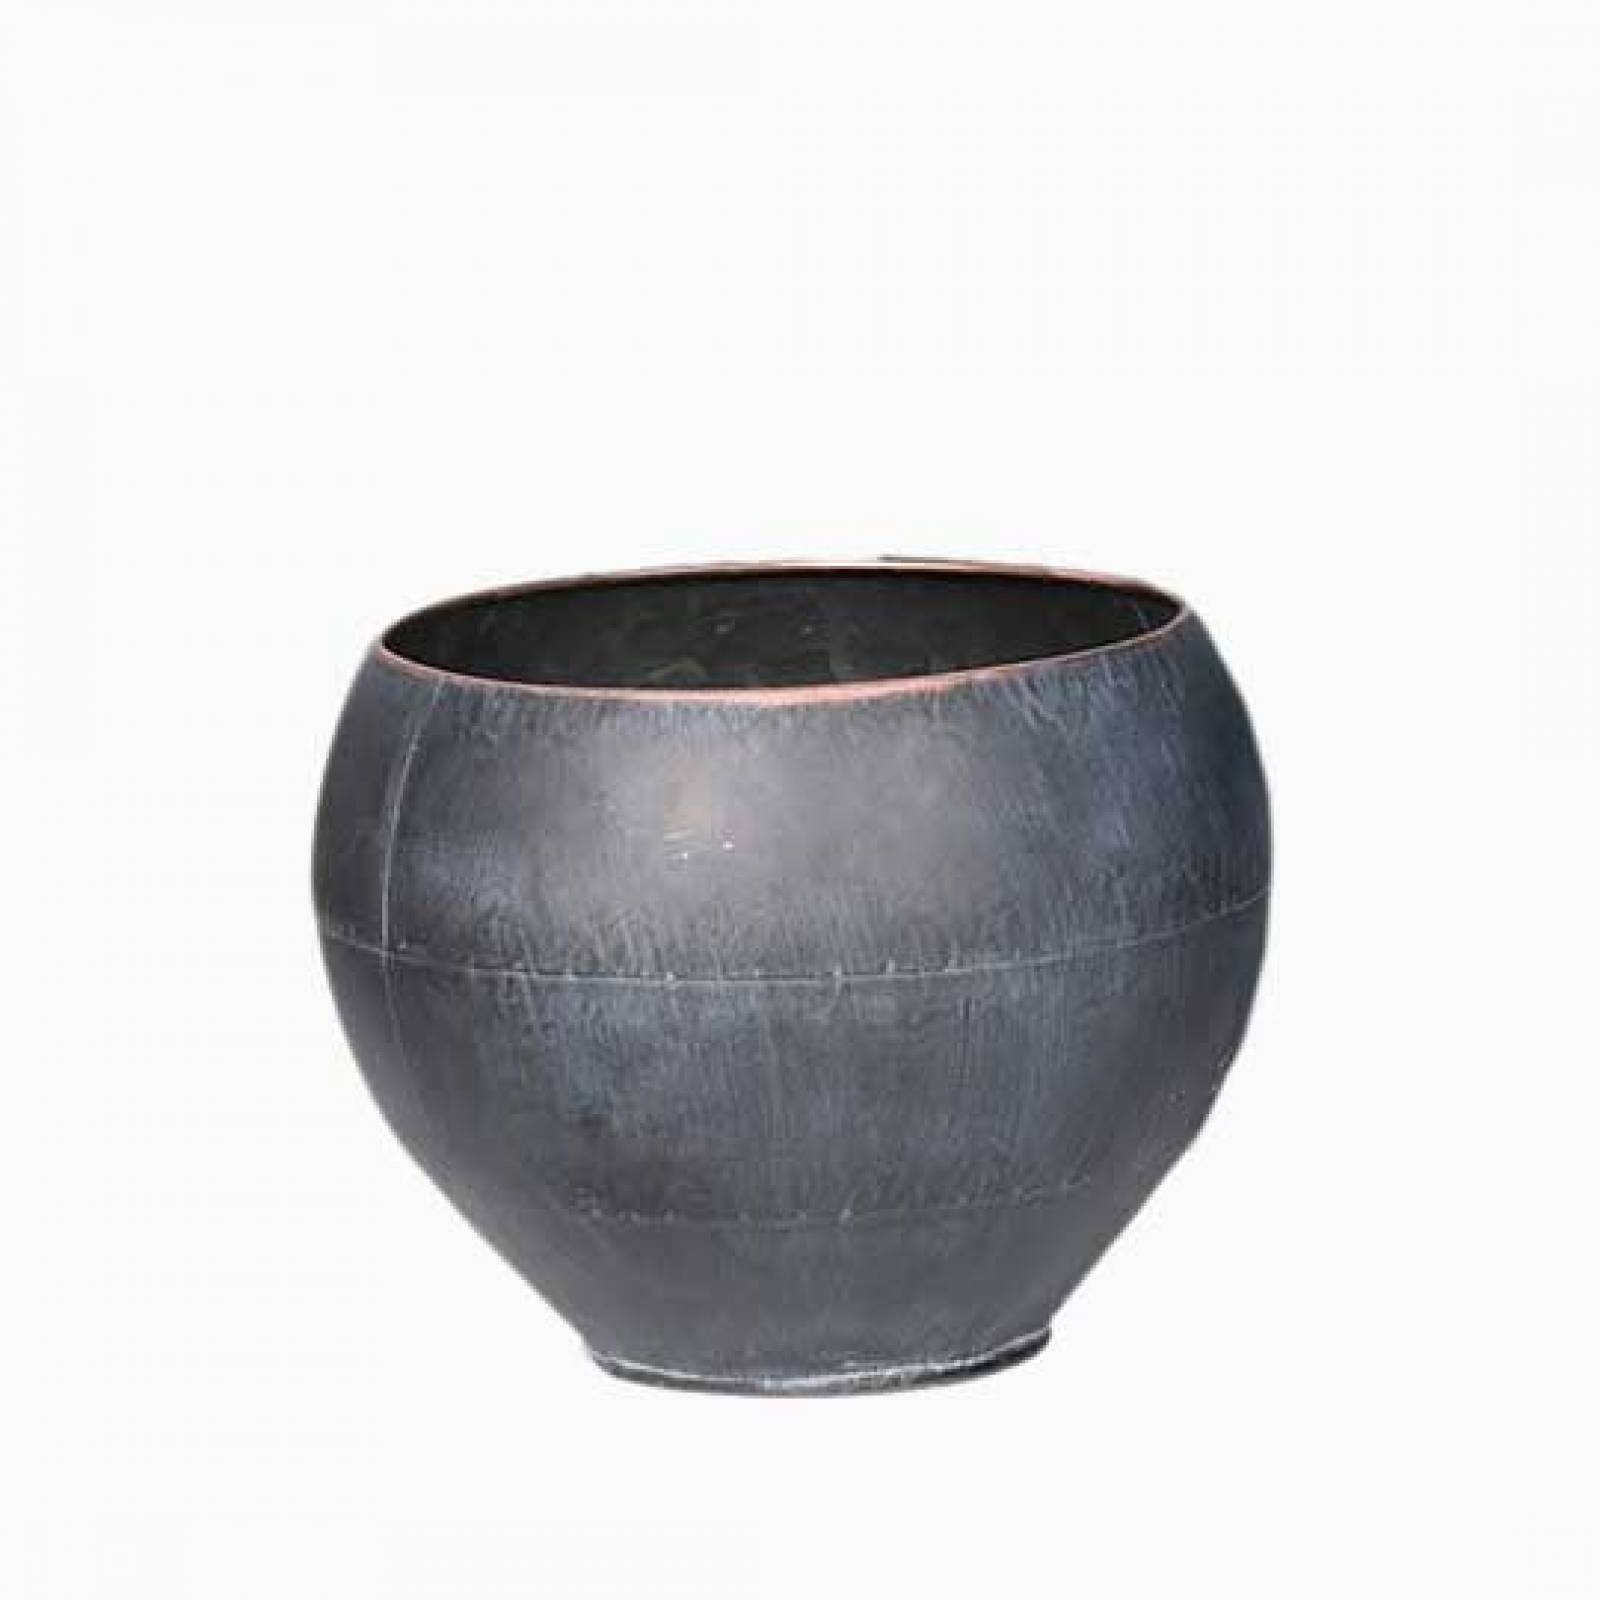 Small Curved Zinc Planter Pot